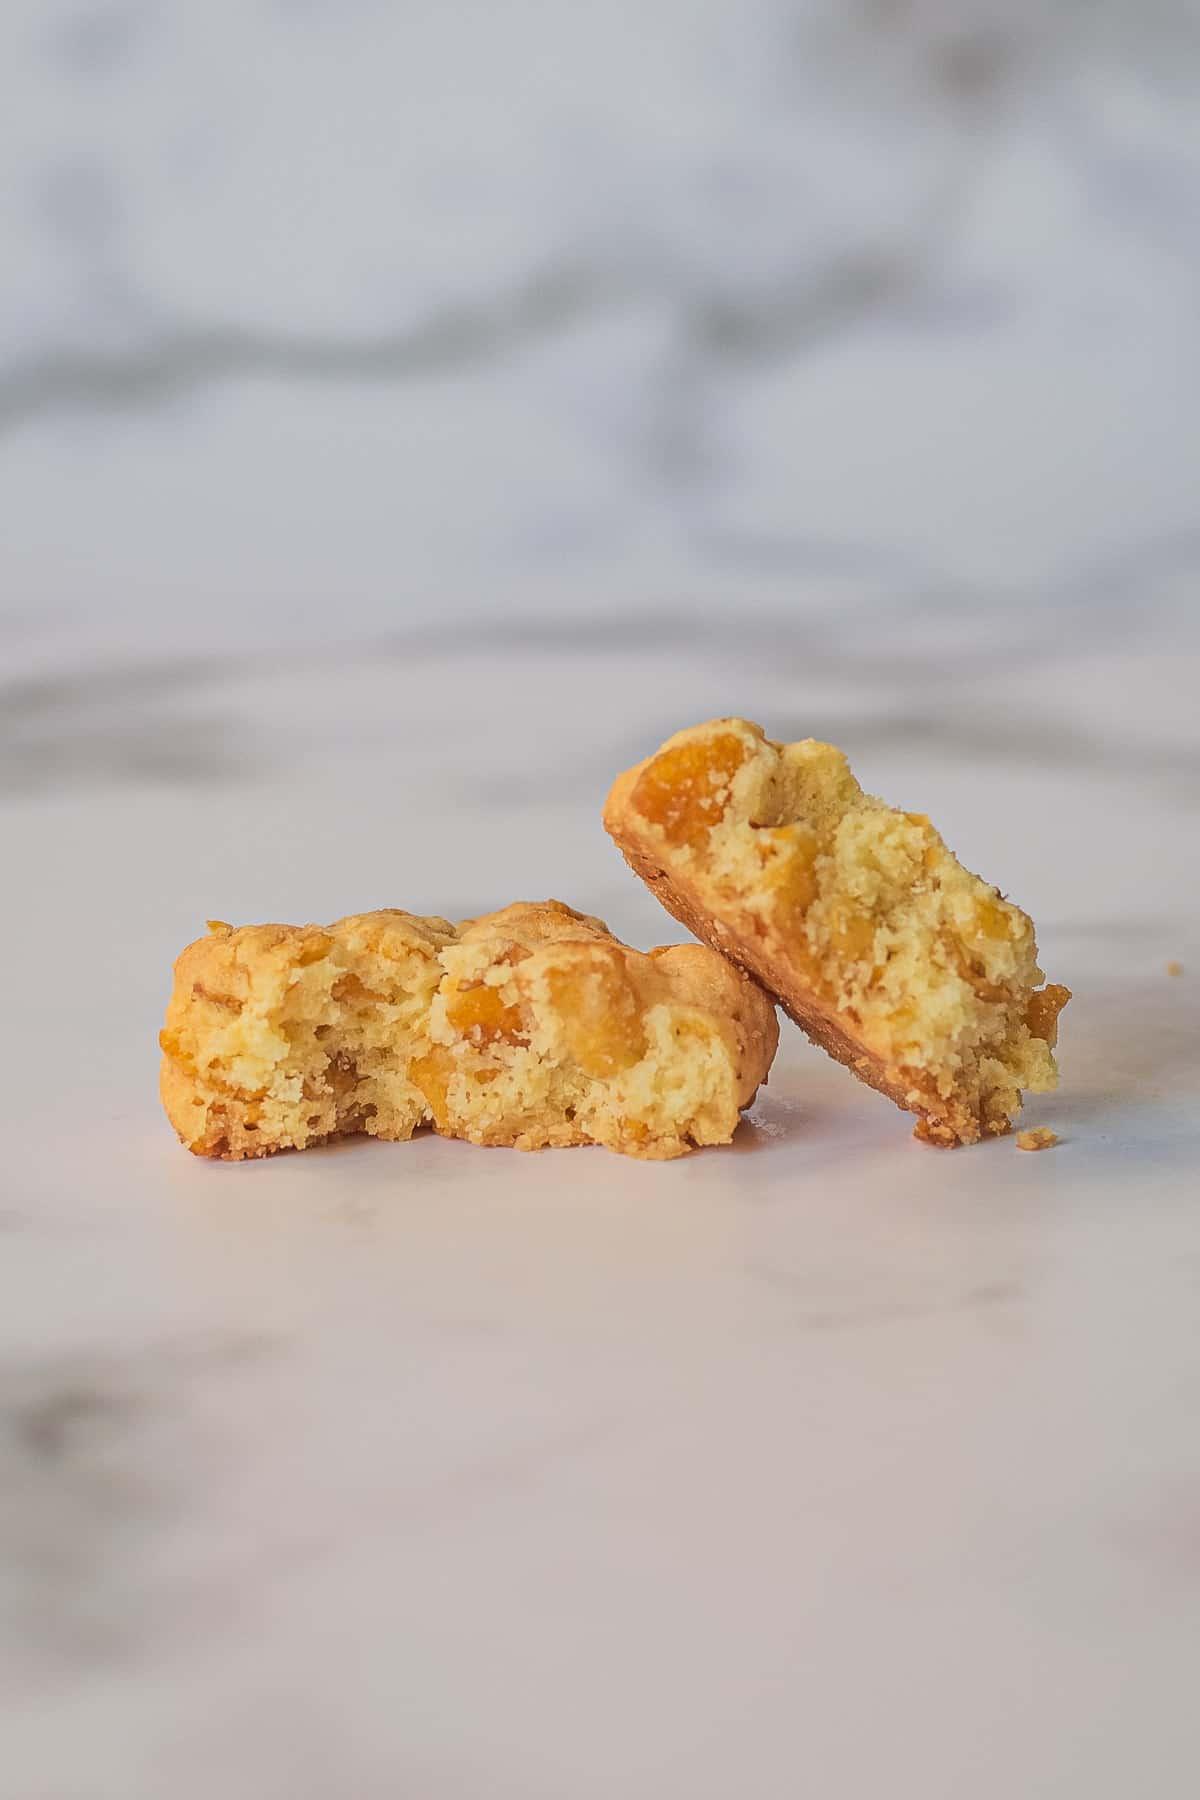 A cornflakes cookie broken into 2